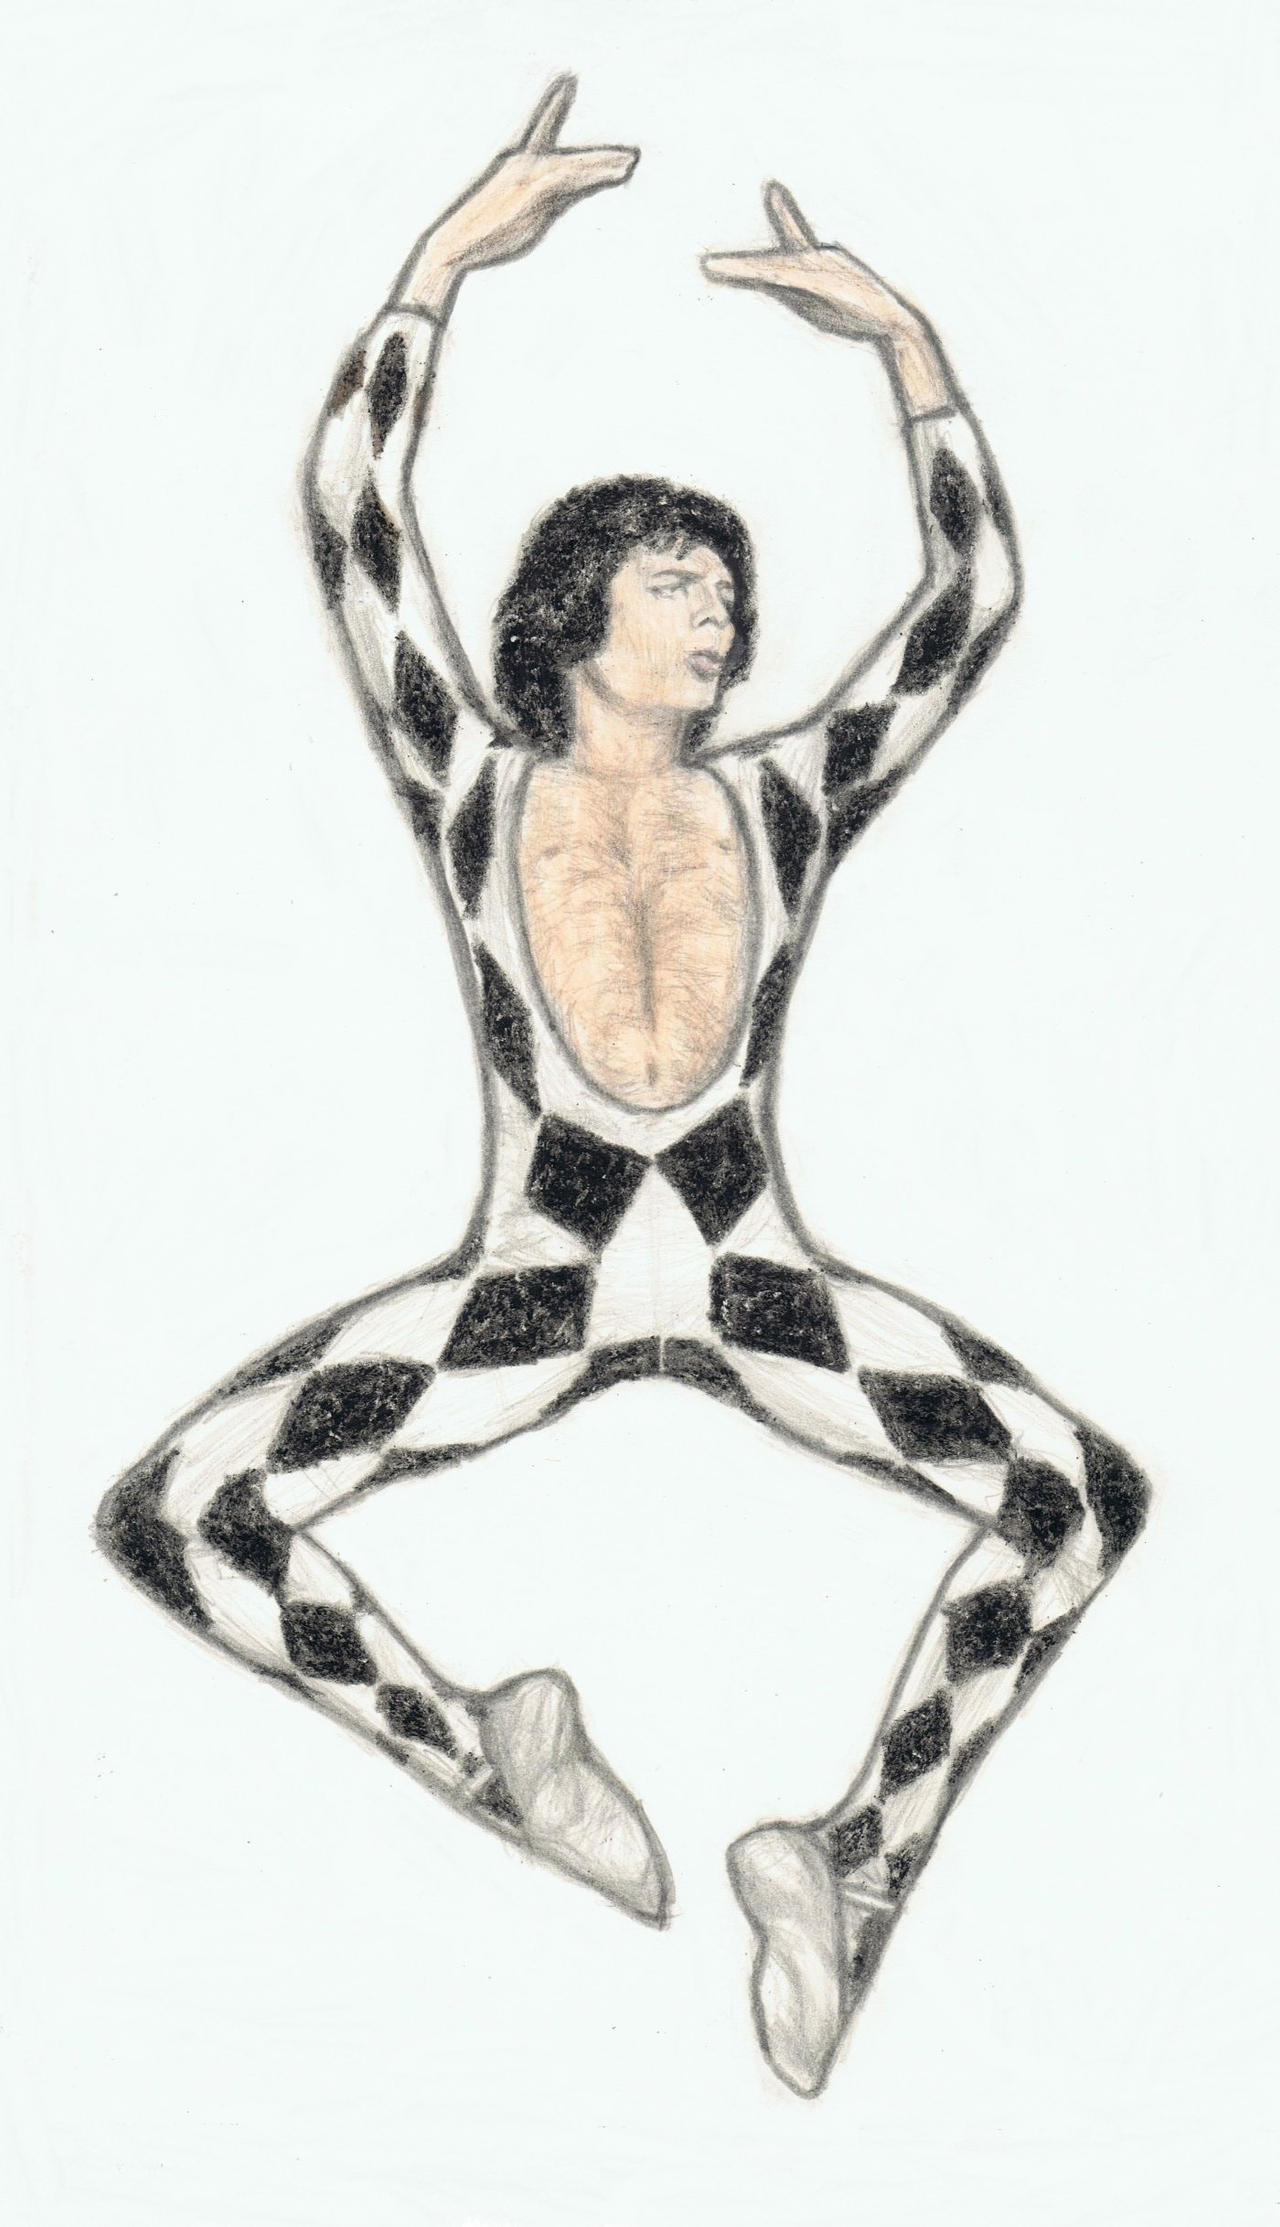 Freddie Mercury as a ballet dancer by gagambo